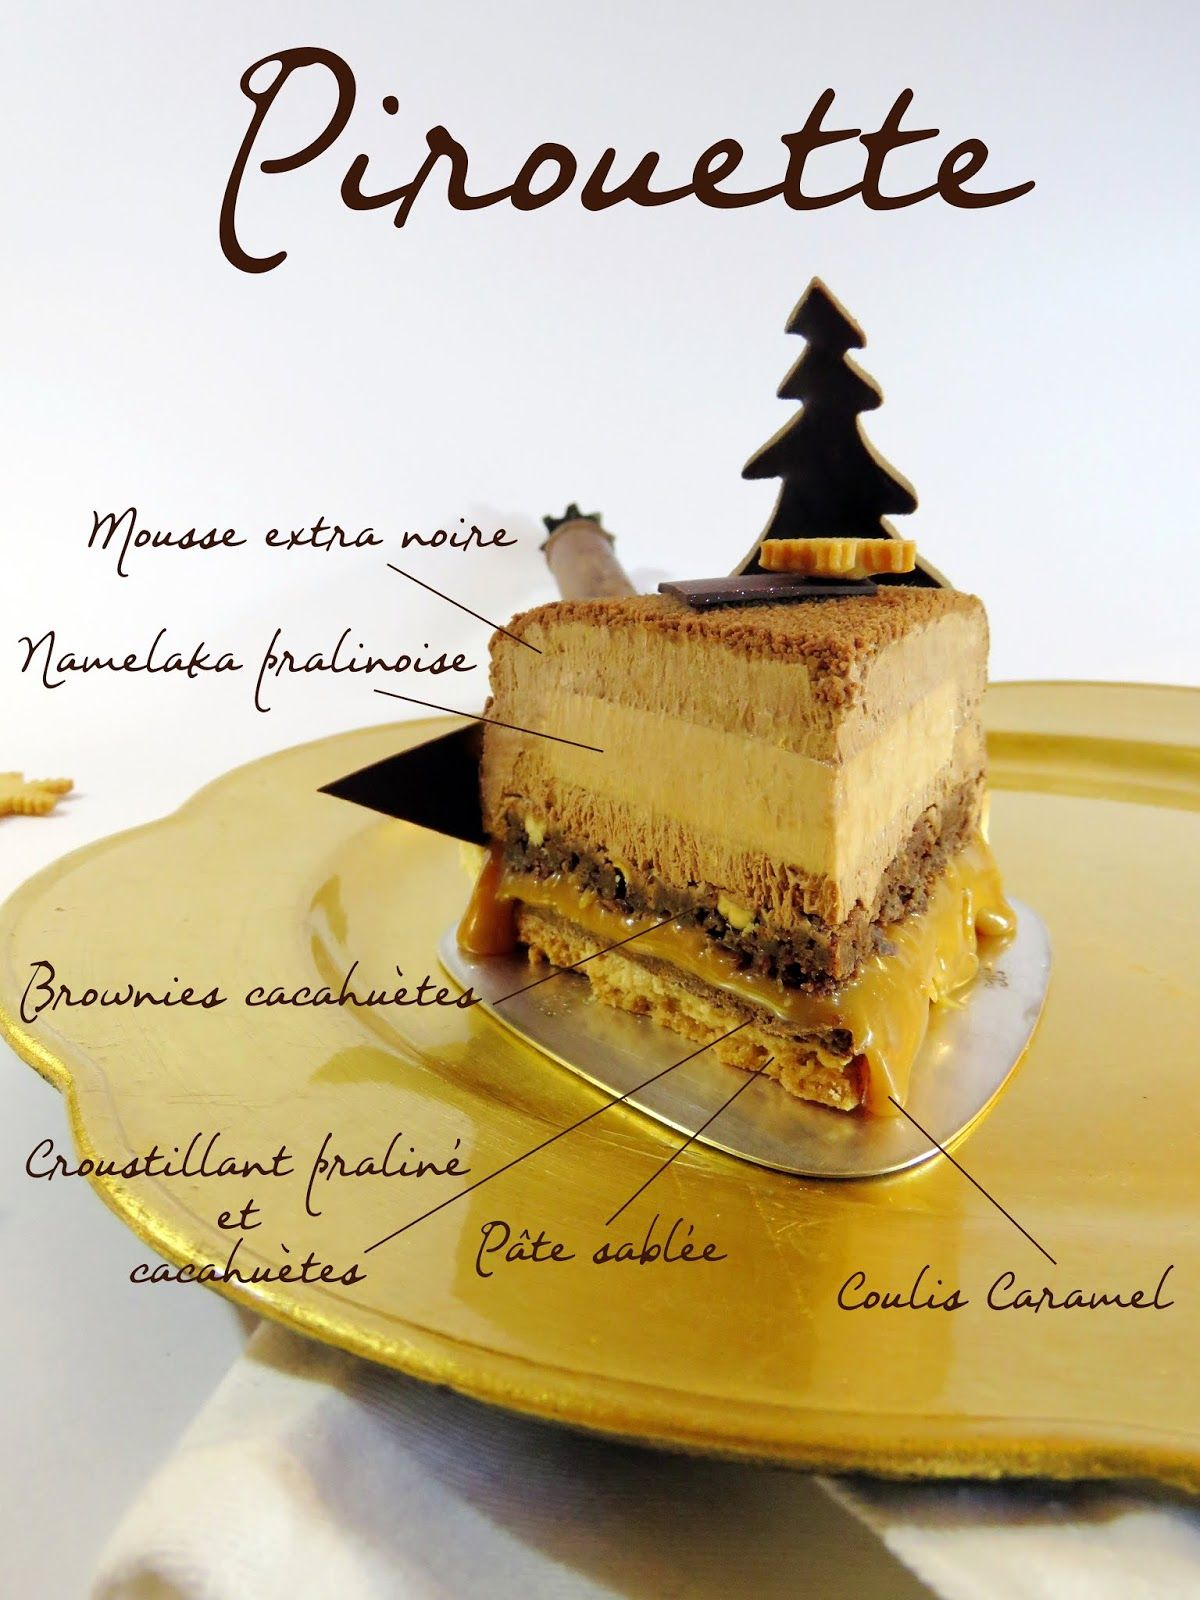 J'en reprendrai bien un bout...: novembre 2018 Schokolade, Praliné, Namelaka, Erdnuss, Karamell